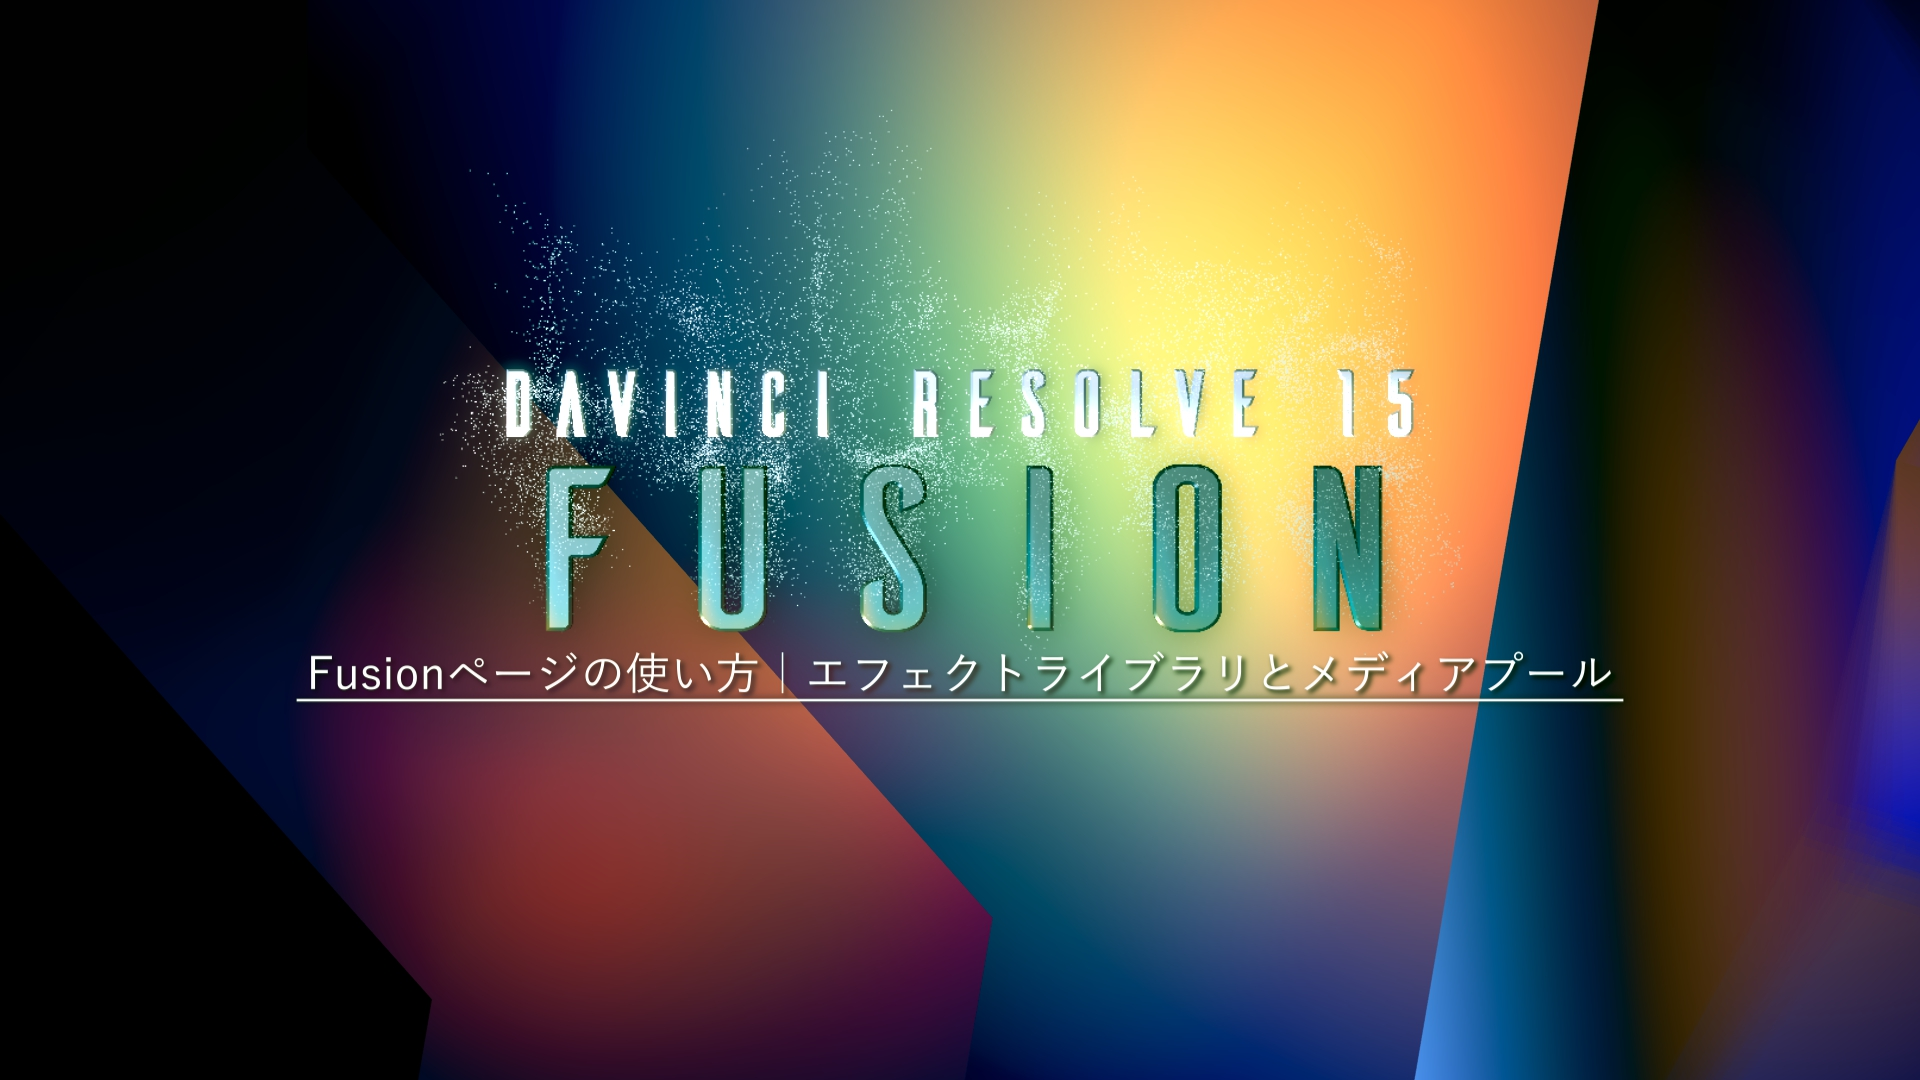 DaVinci Resolve 15 Fusion の 使い方 (3) エフェクトライブラリとメディアプール